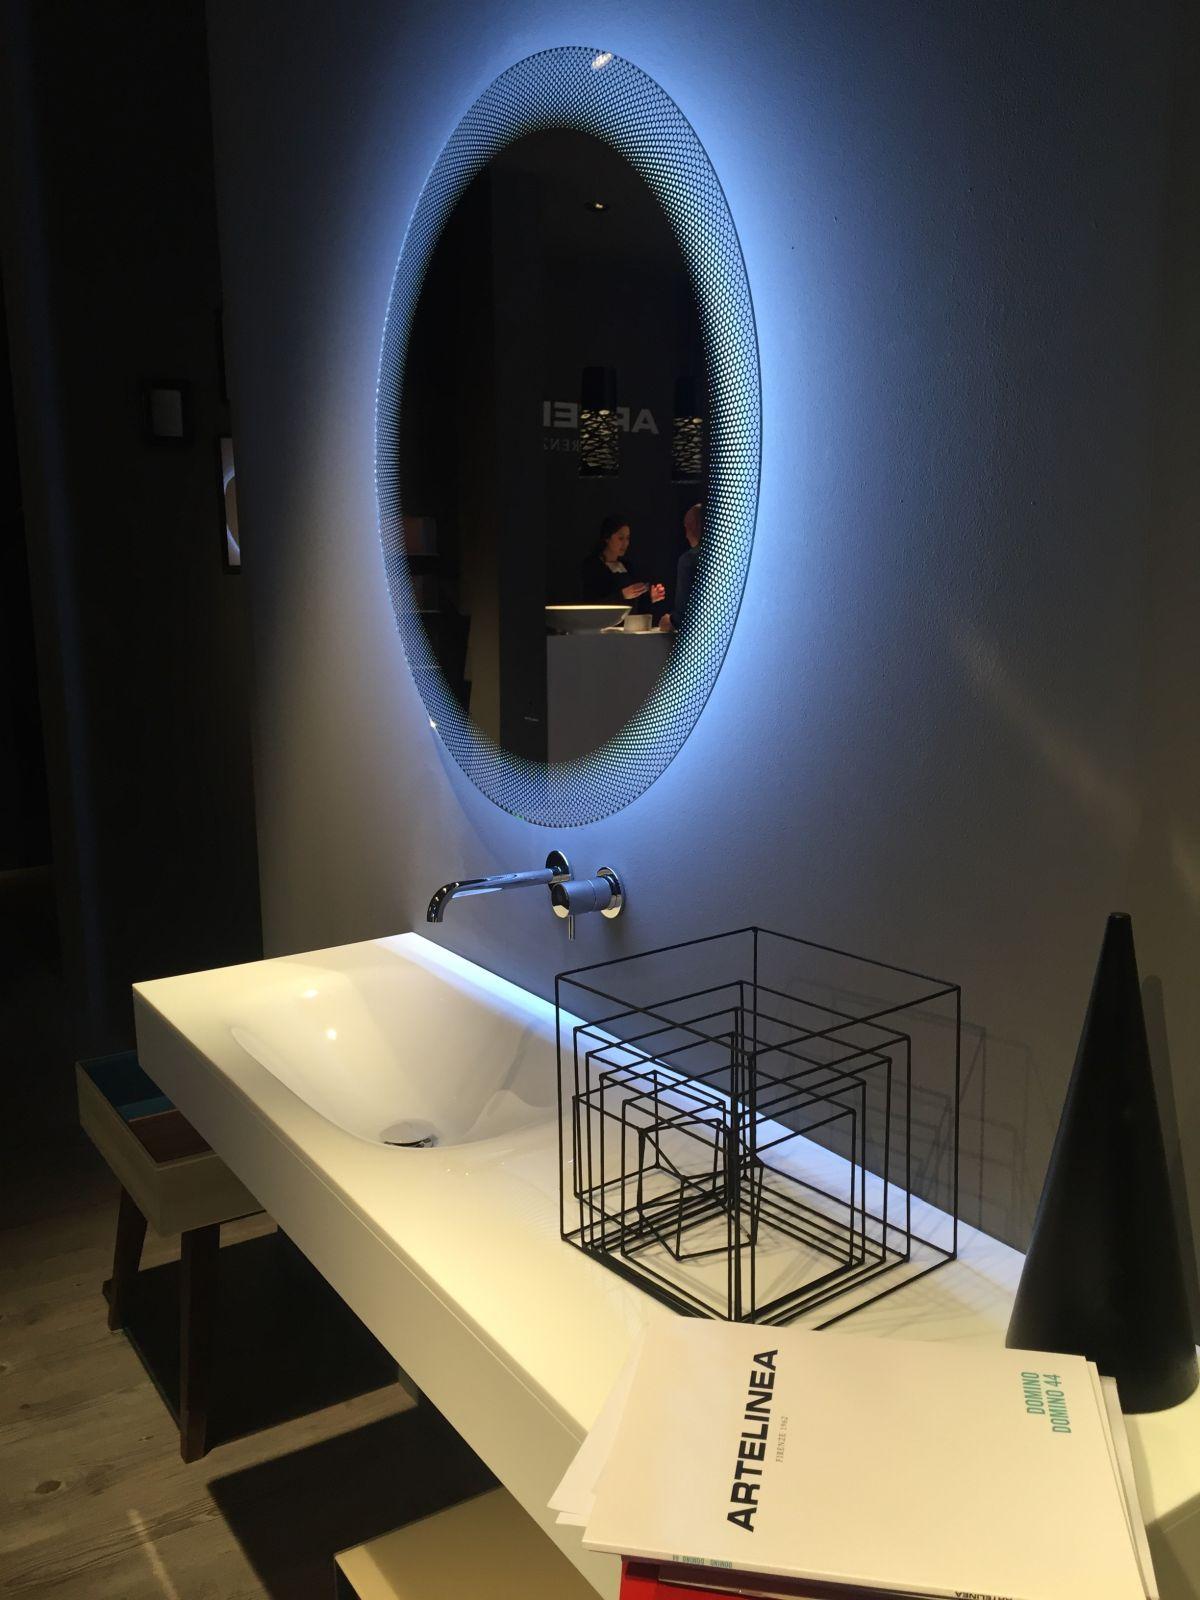 Artelinea bathroom design with mirror